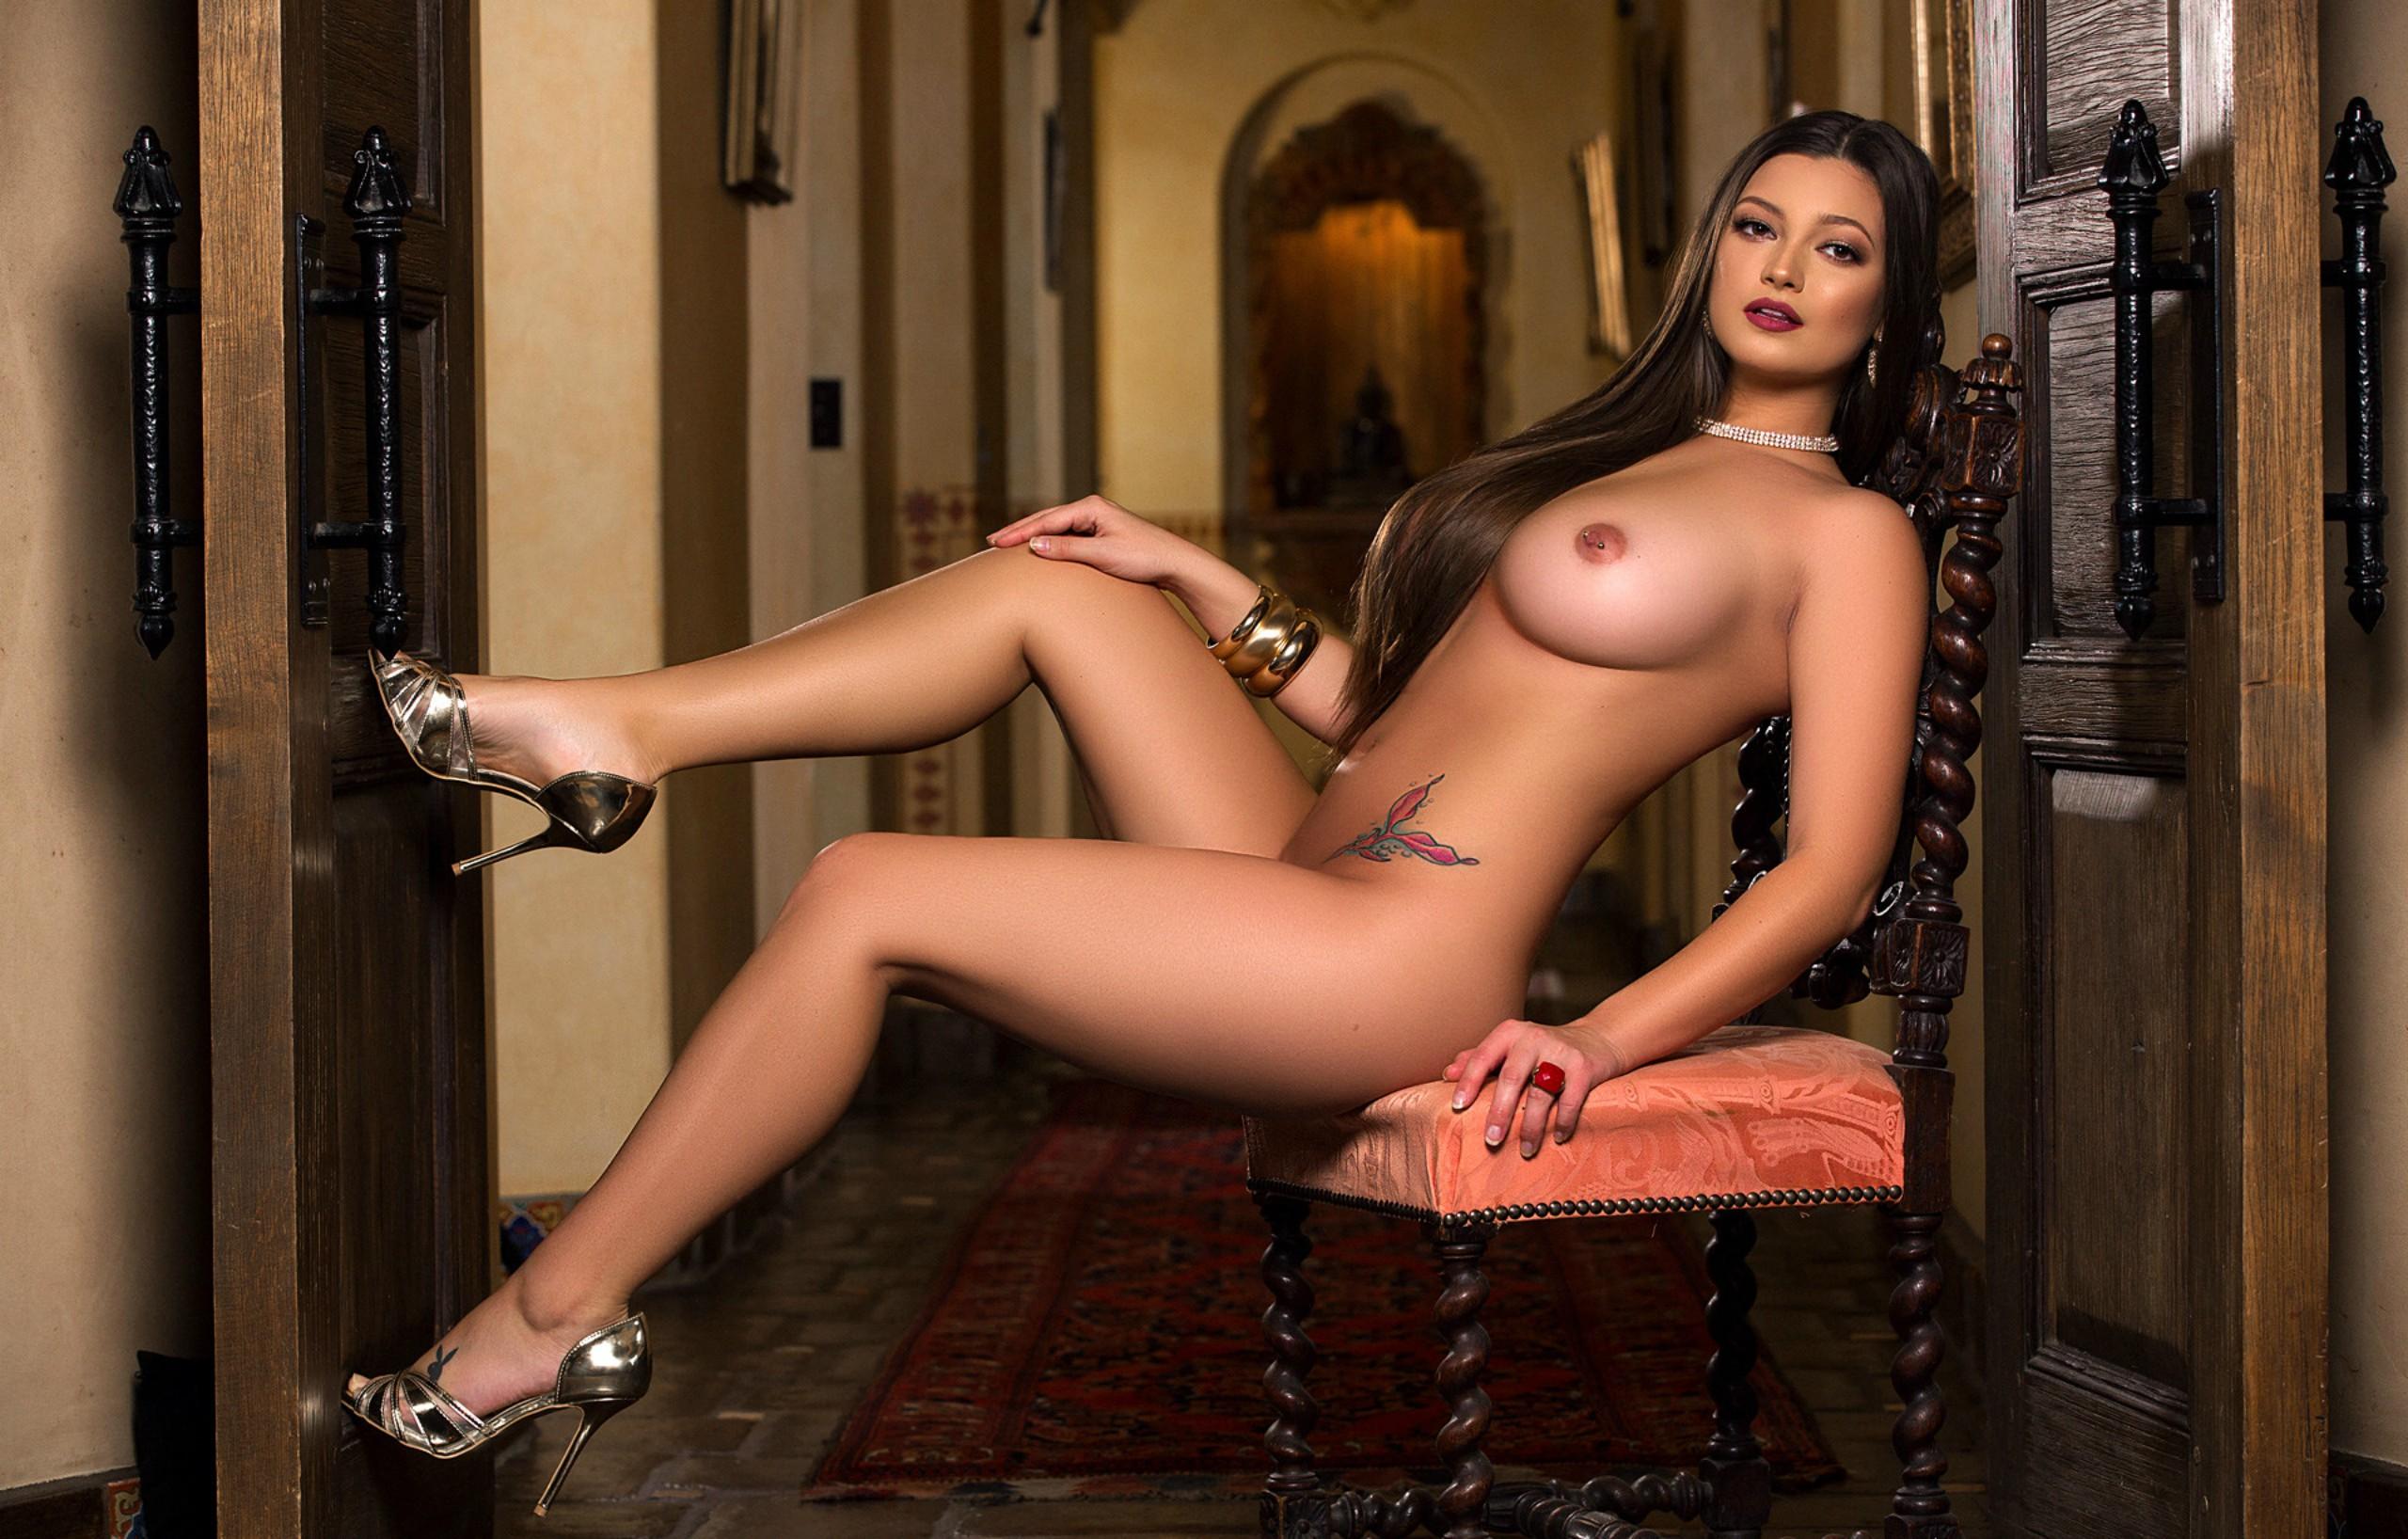 Playboy plus best porn pics